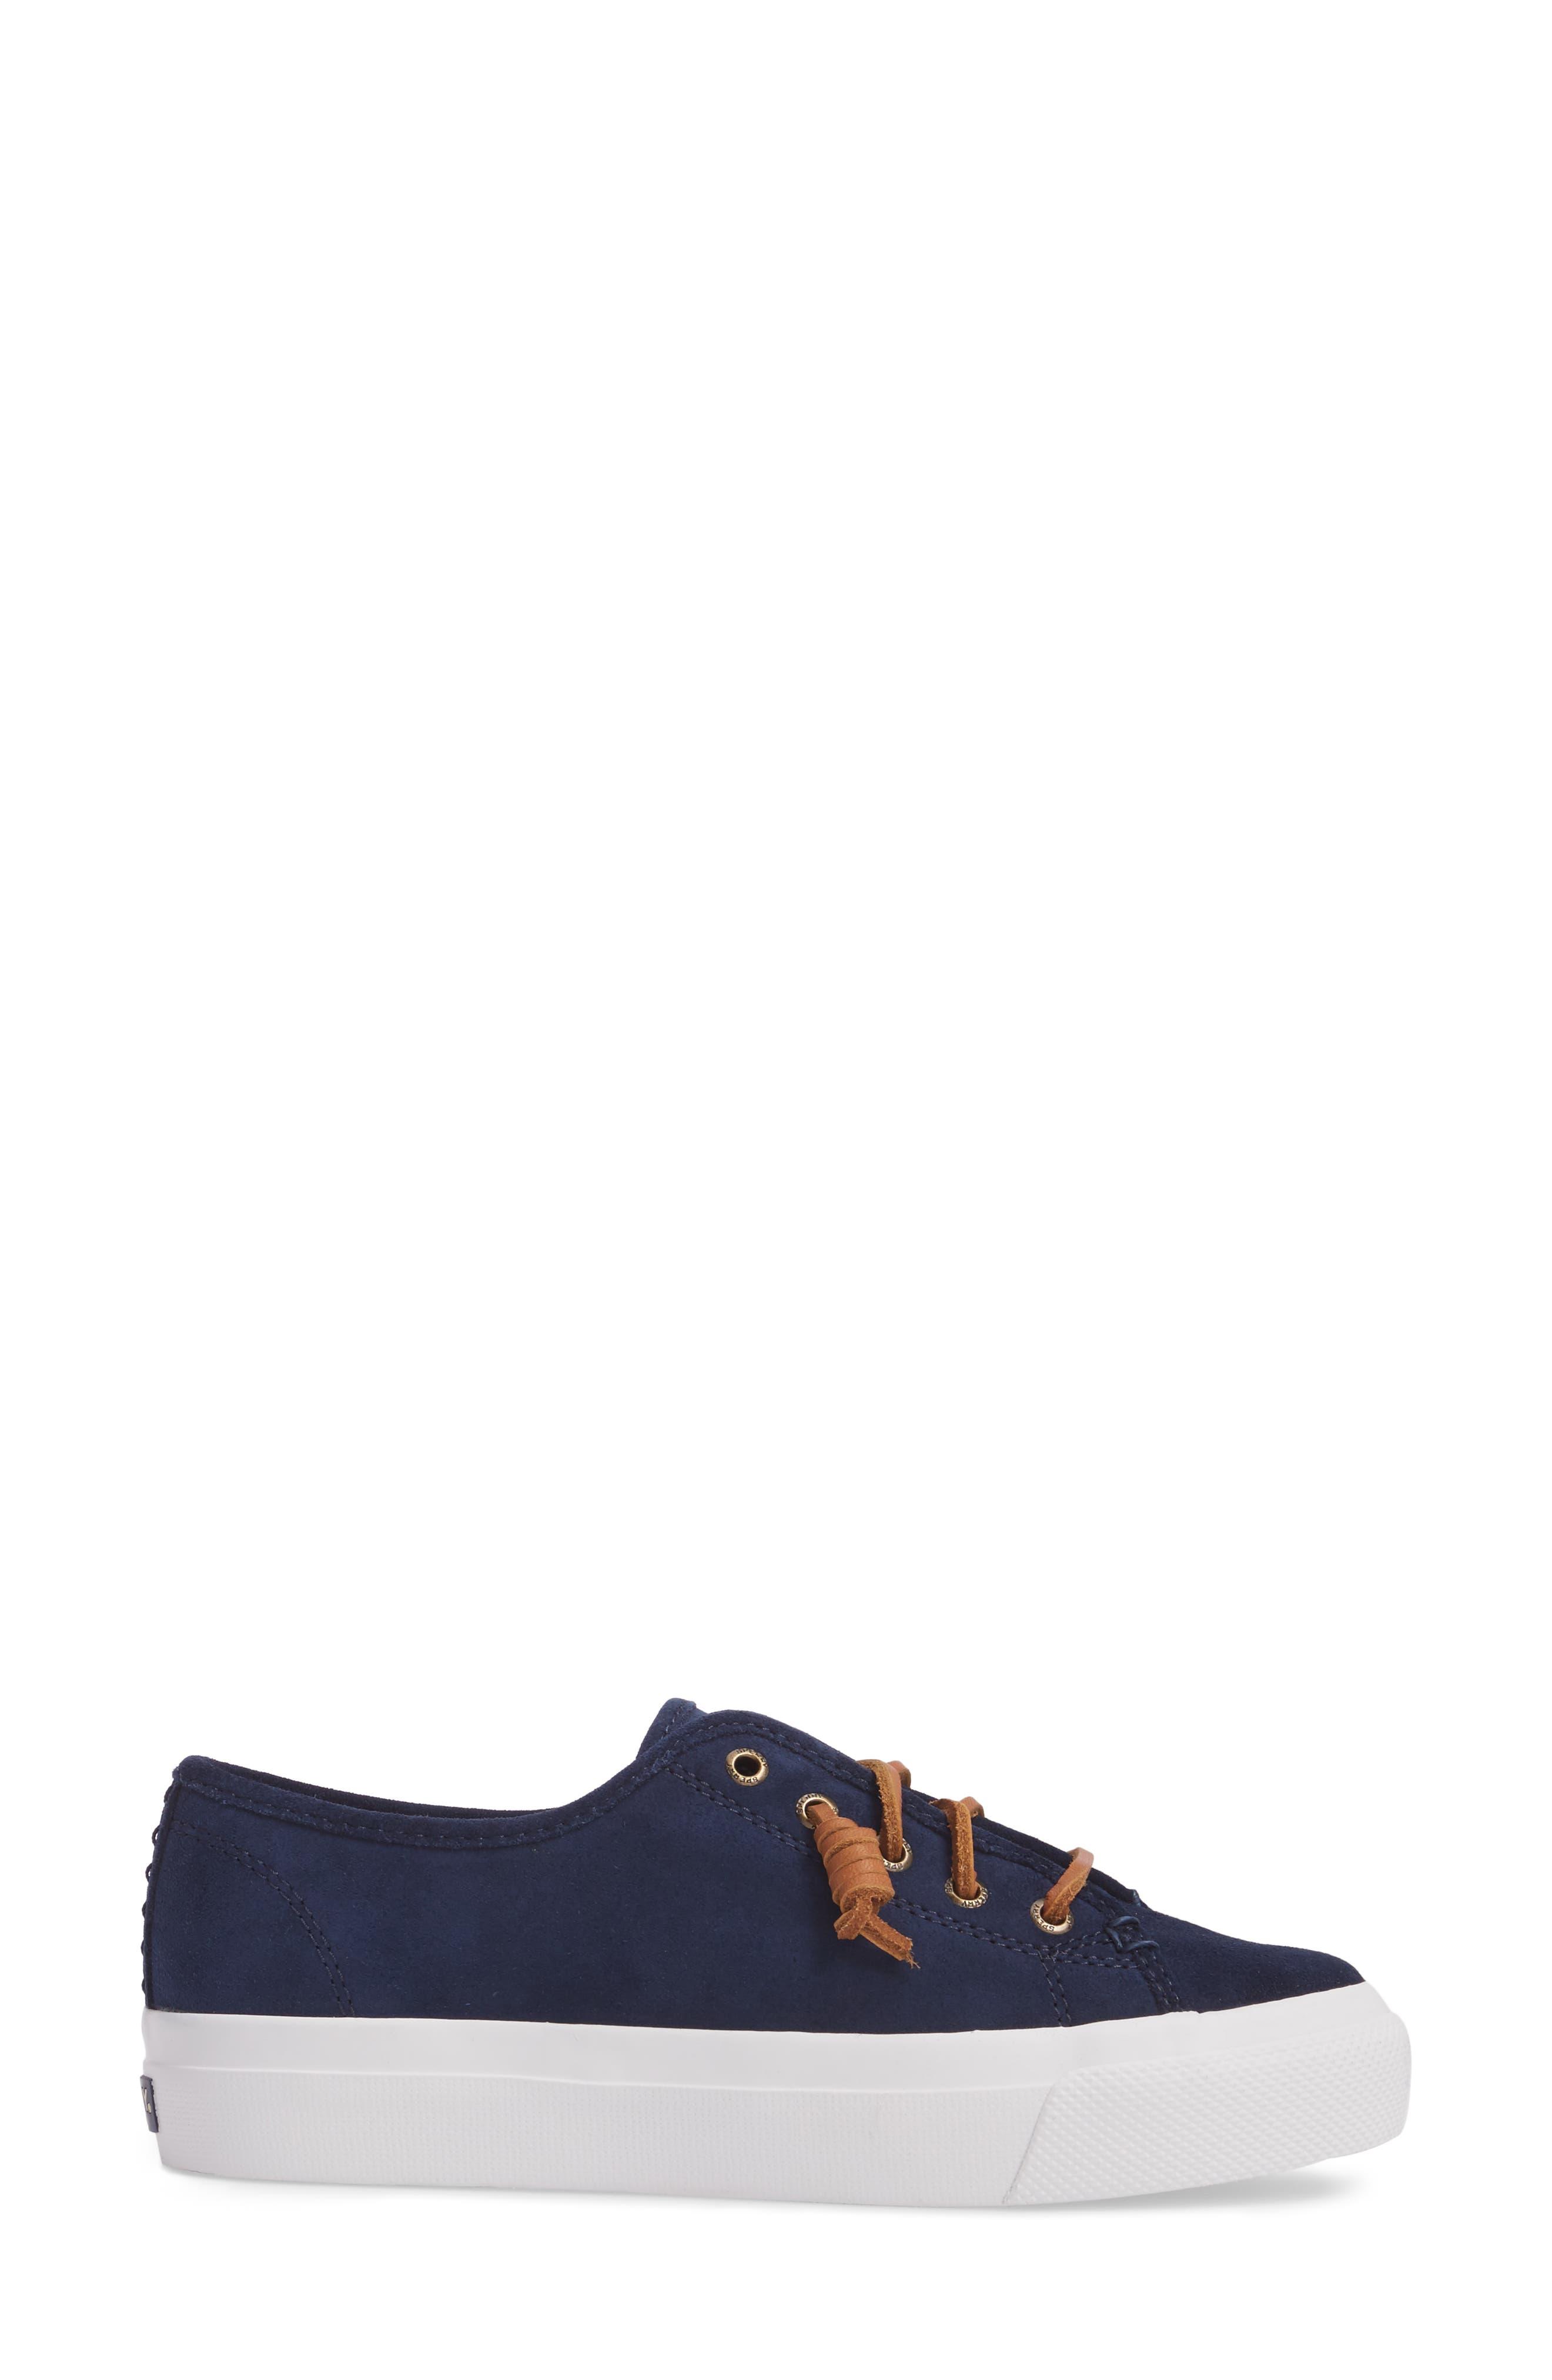 Sky Sail Platform Sneaker,                             Alternate thumbnail 3, color,                             410